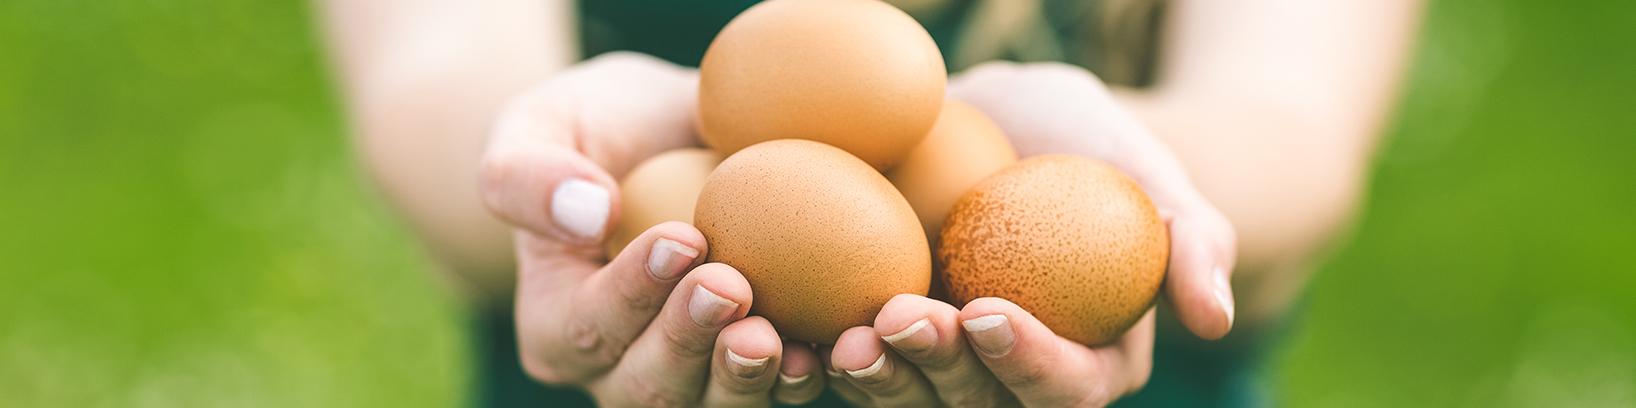 Egg freezing may benefit those with endometriosis